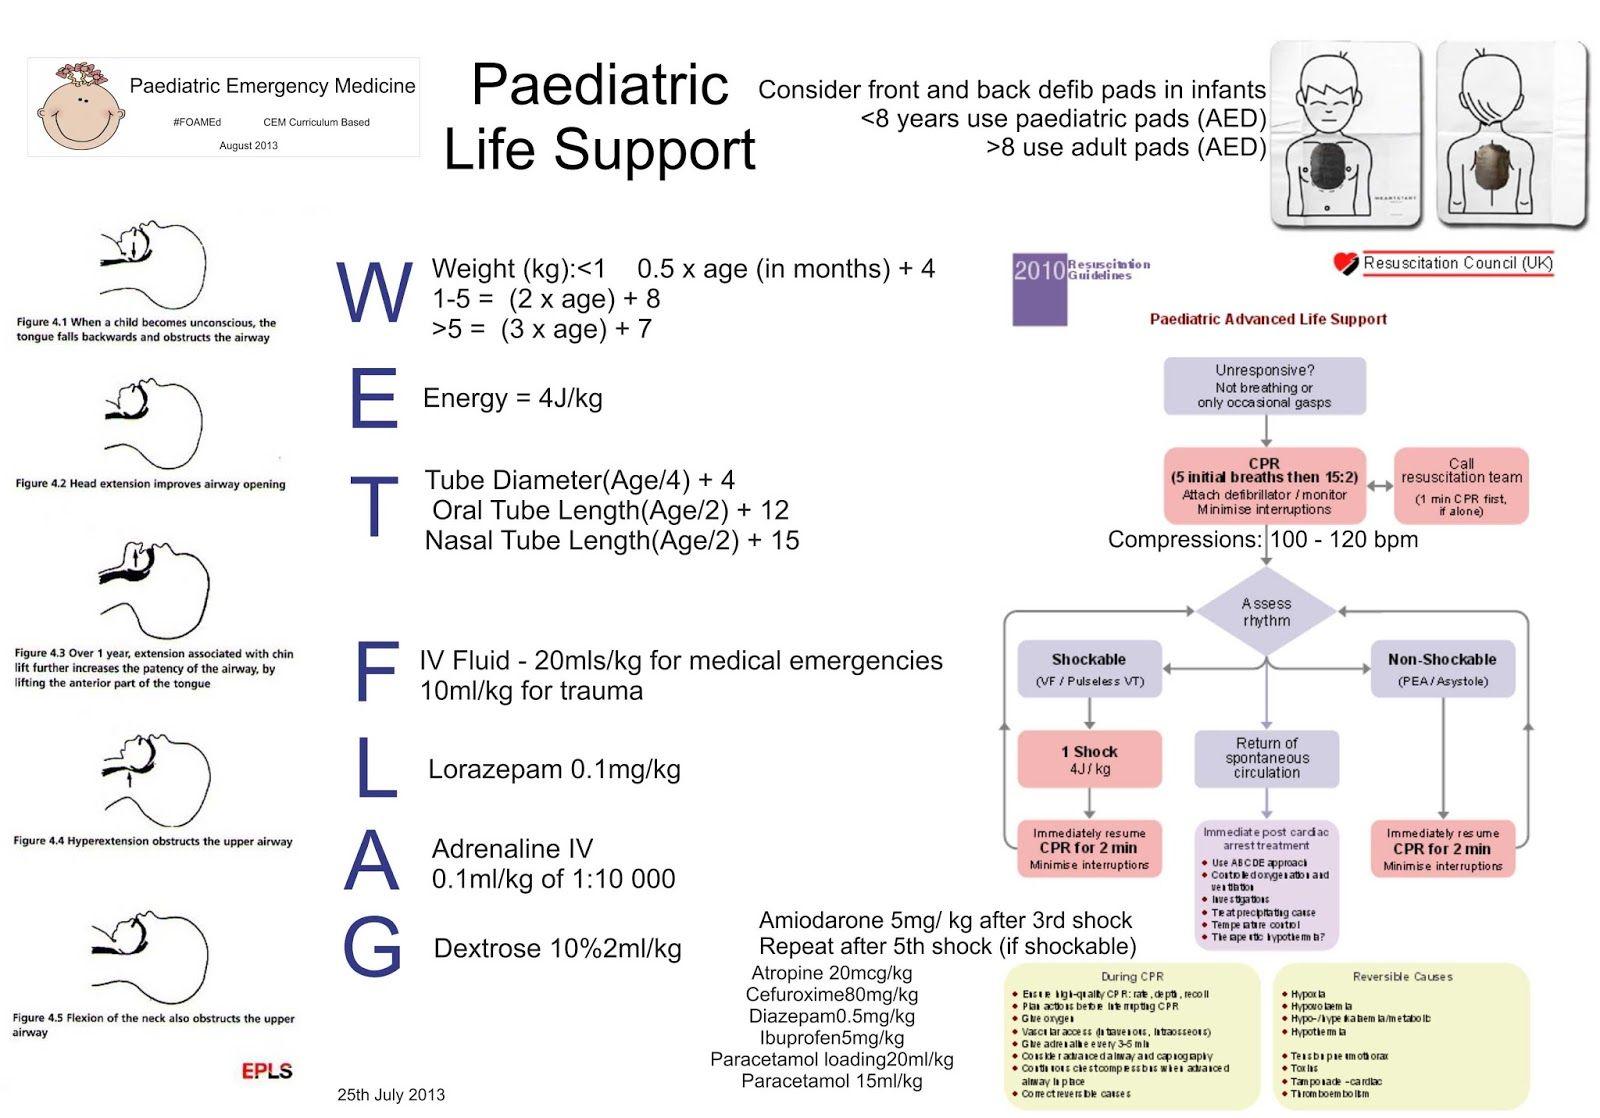 Http 1 Bp Blogspot Com Uskfwj U5wq Ugfhmhev26i Aaaaaaaafe0 43fxdxlwbvk S1600 Pals Jpg Pediatrics Medical Studies Emergency Medicine